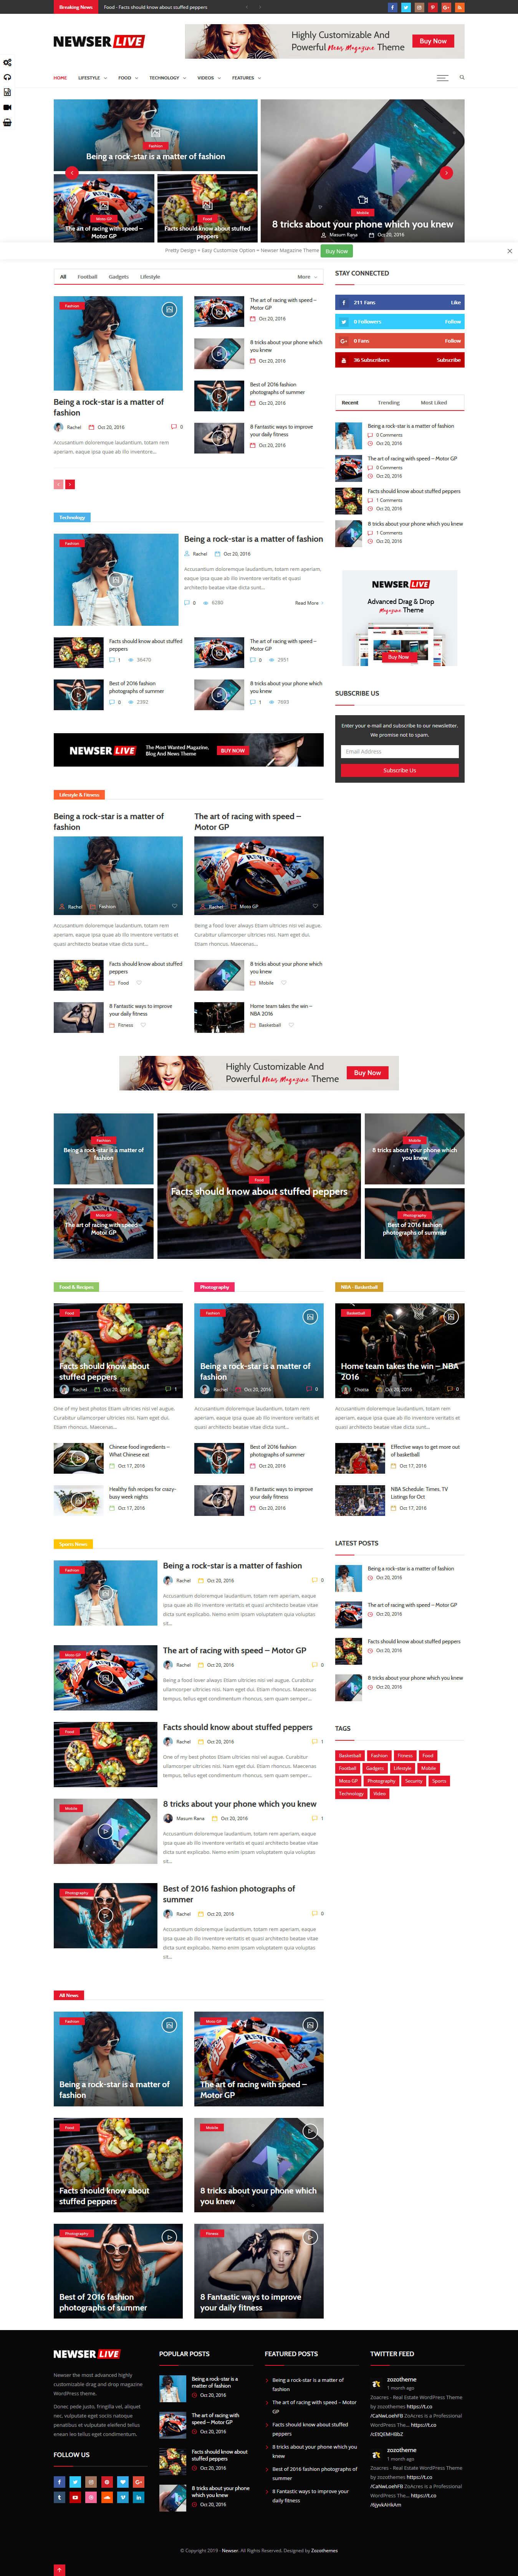 newser best premium drag drop wordpress theme - 10+ Best Premium Drag and Drop WordPress Themes